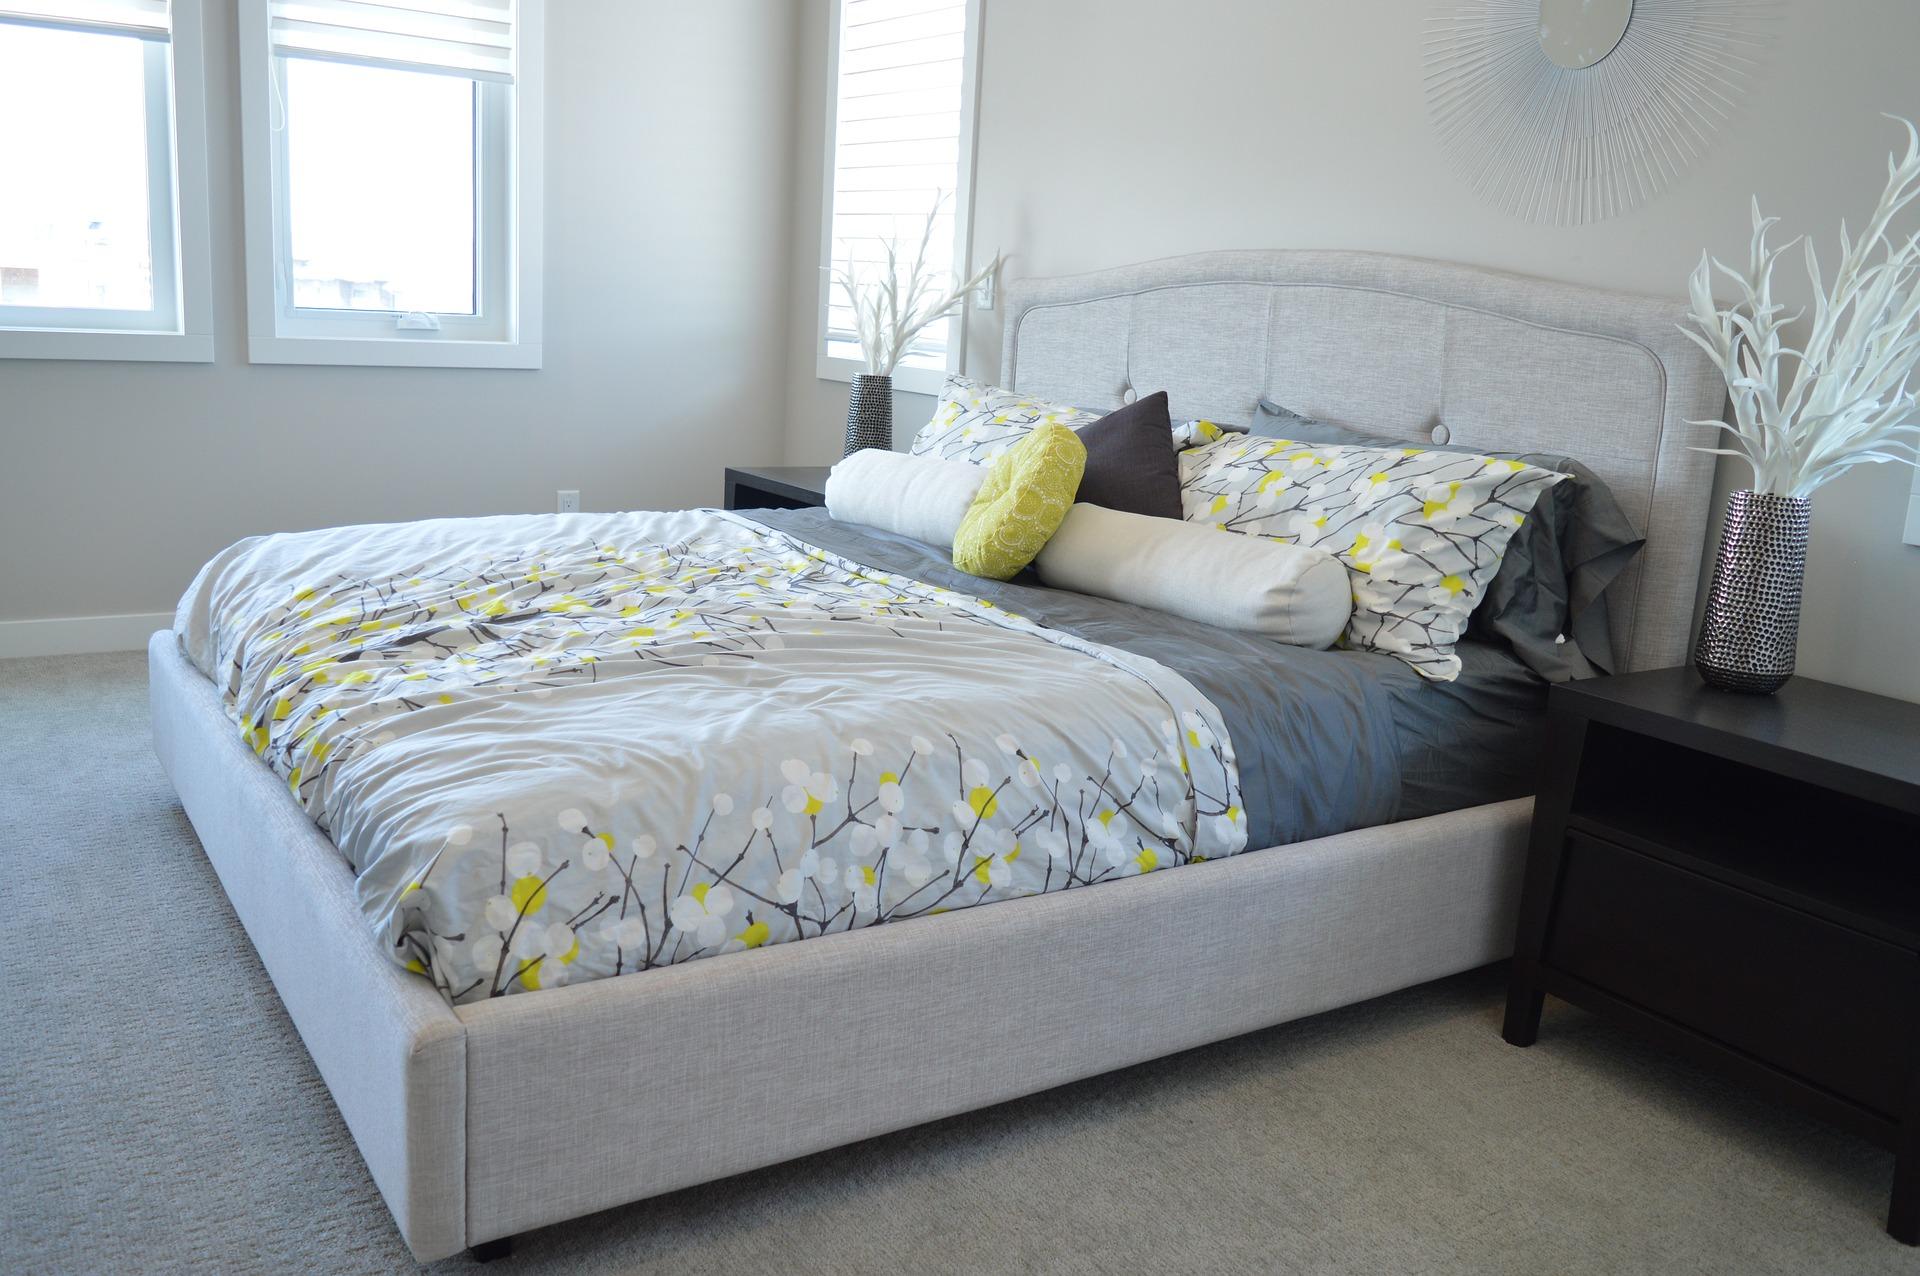 bed-1575491_1920.jpg